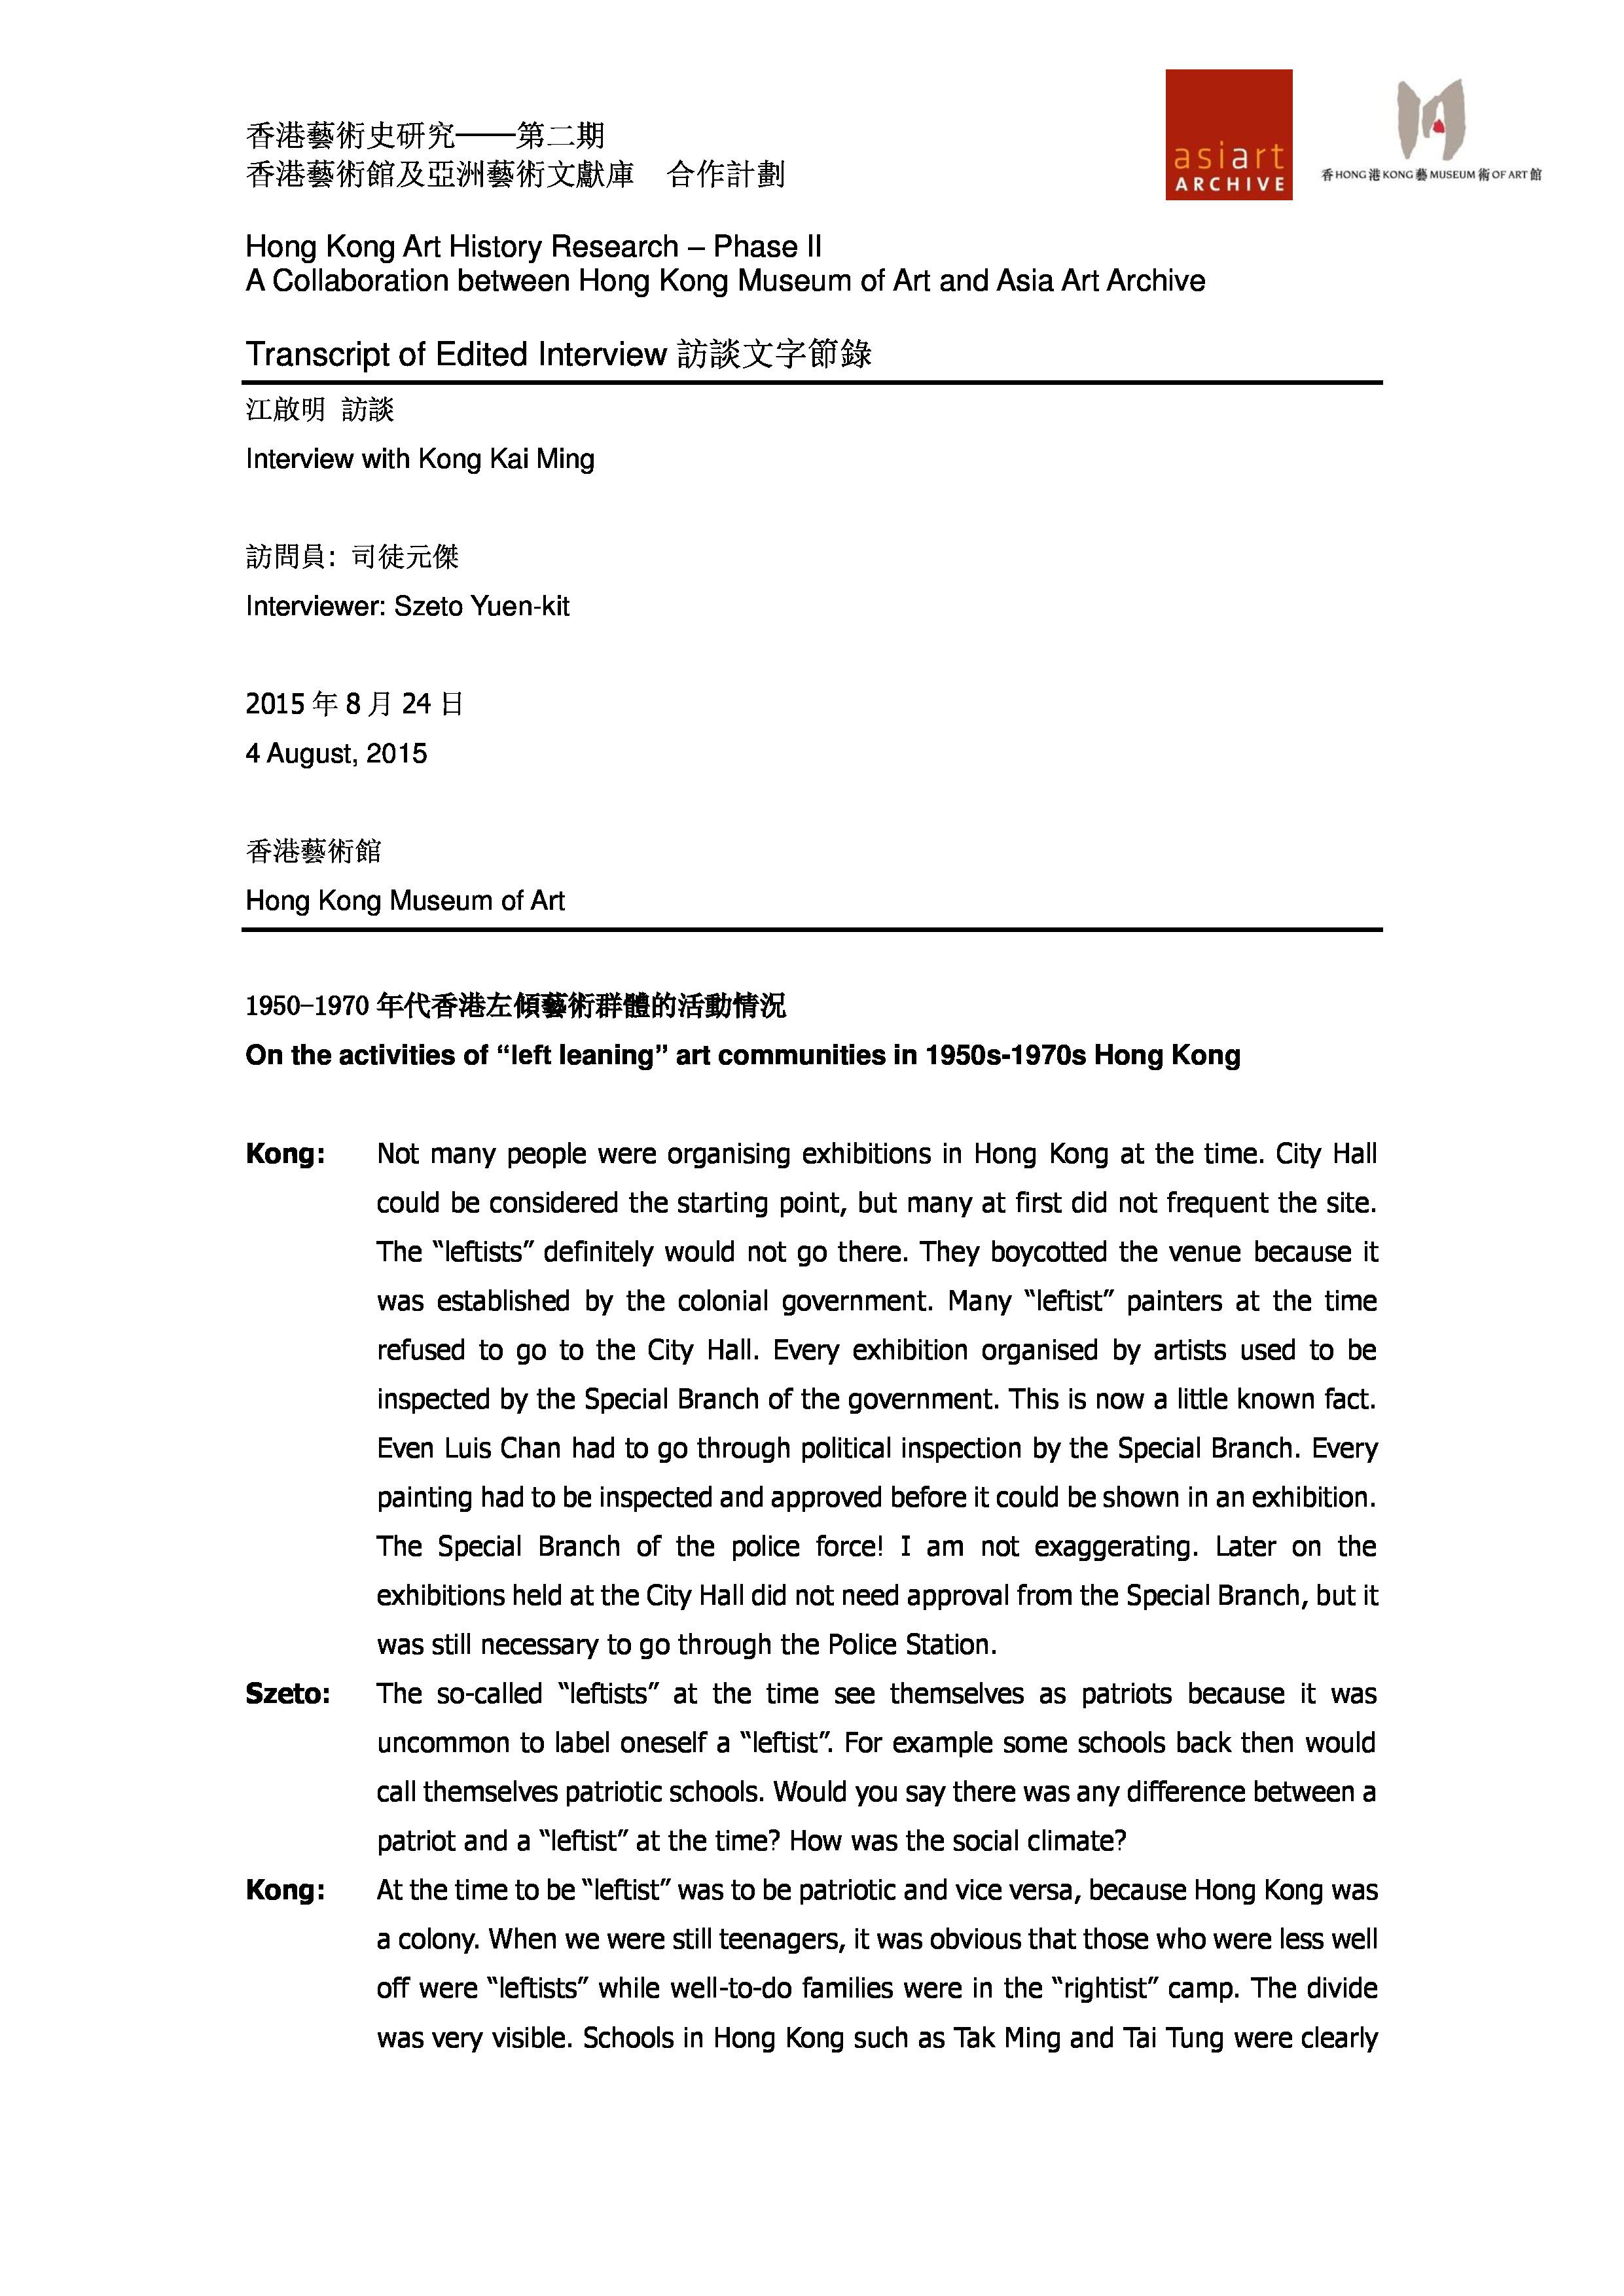 Interview: Kong Kai Ming — Transcript (English)